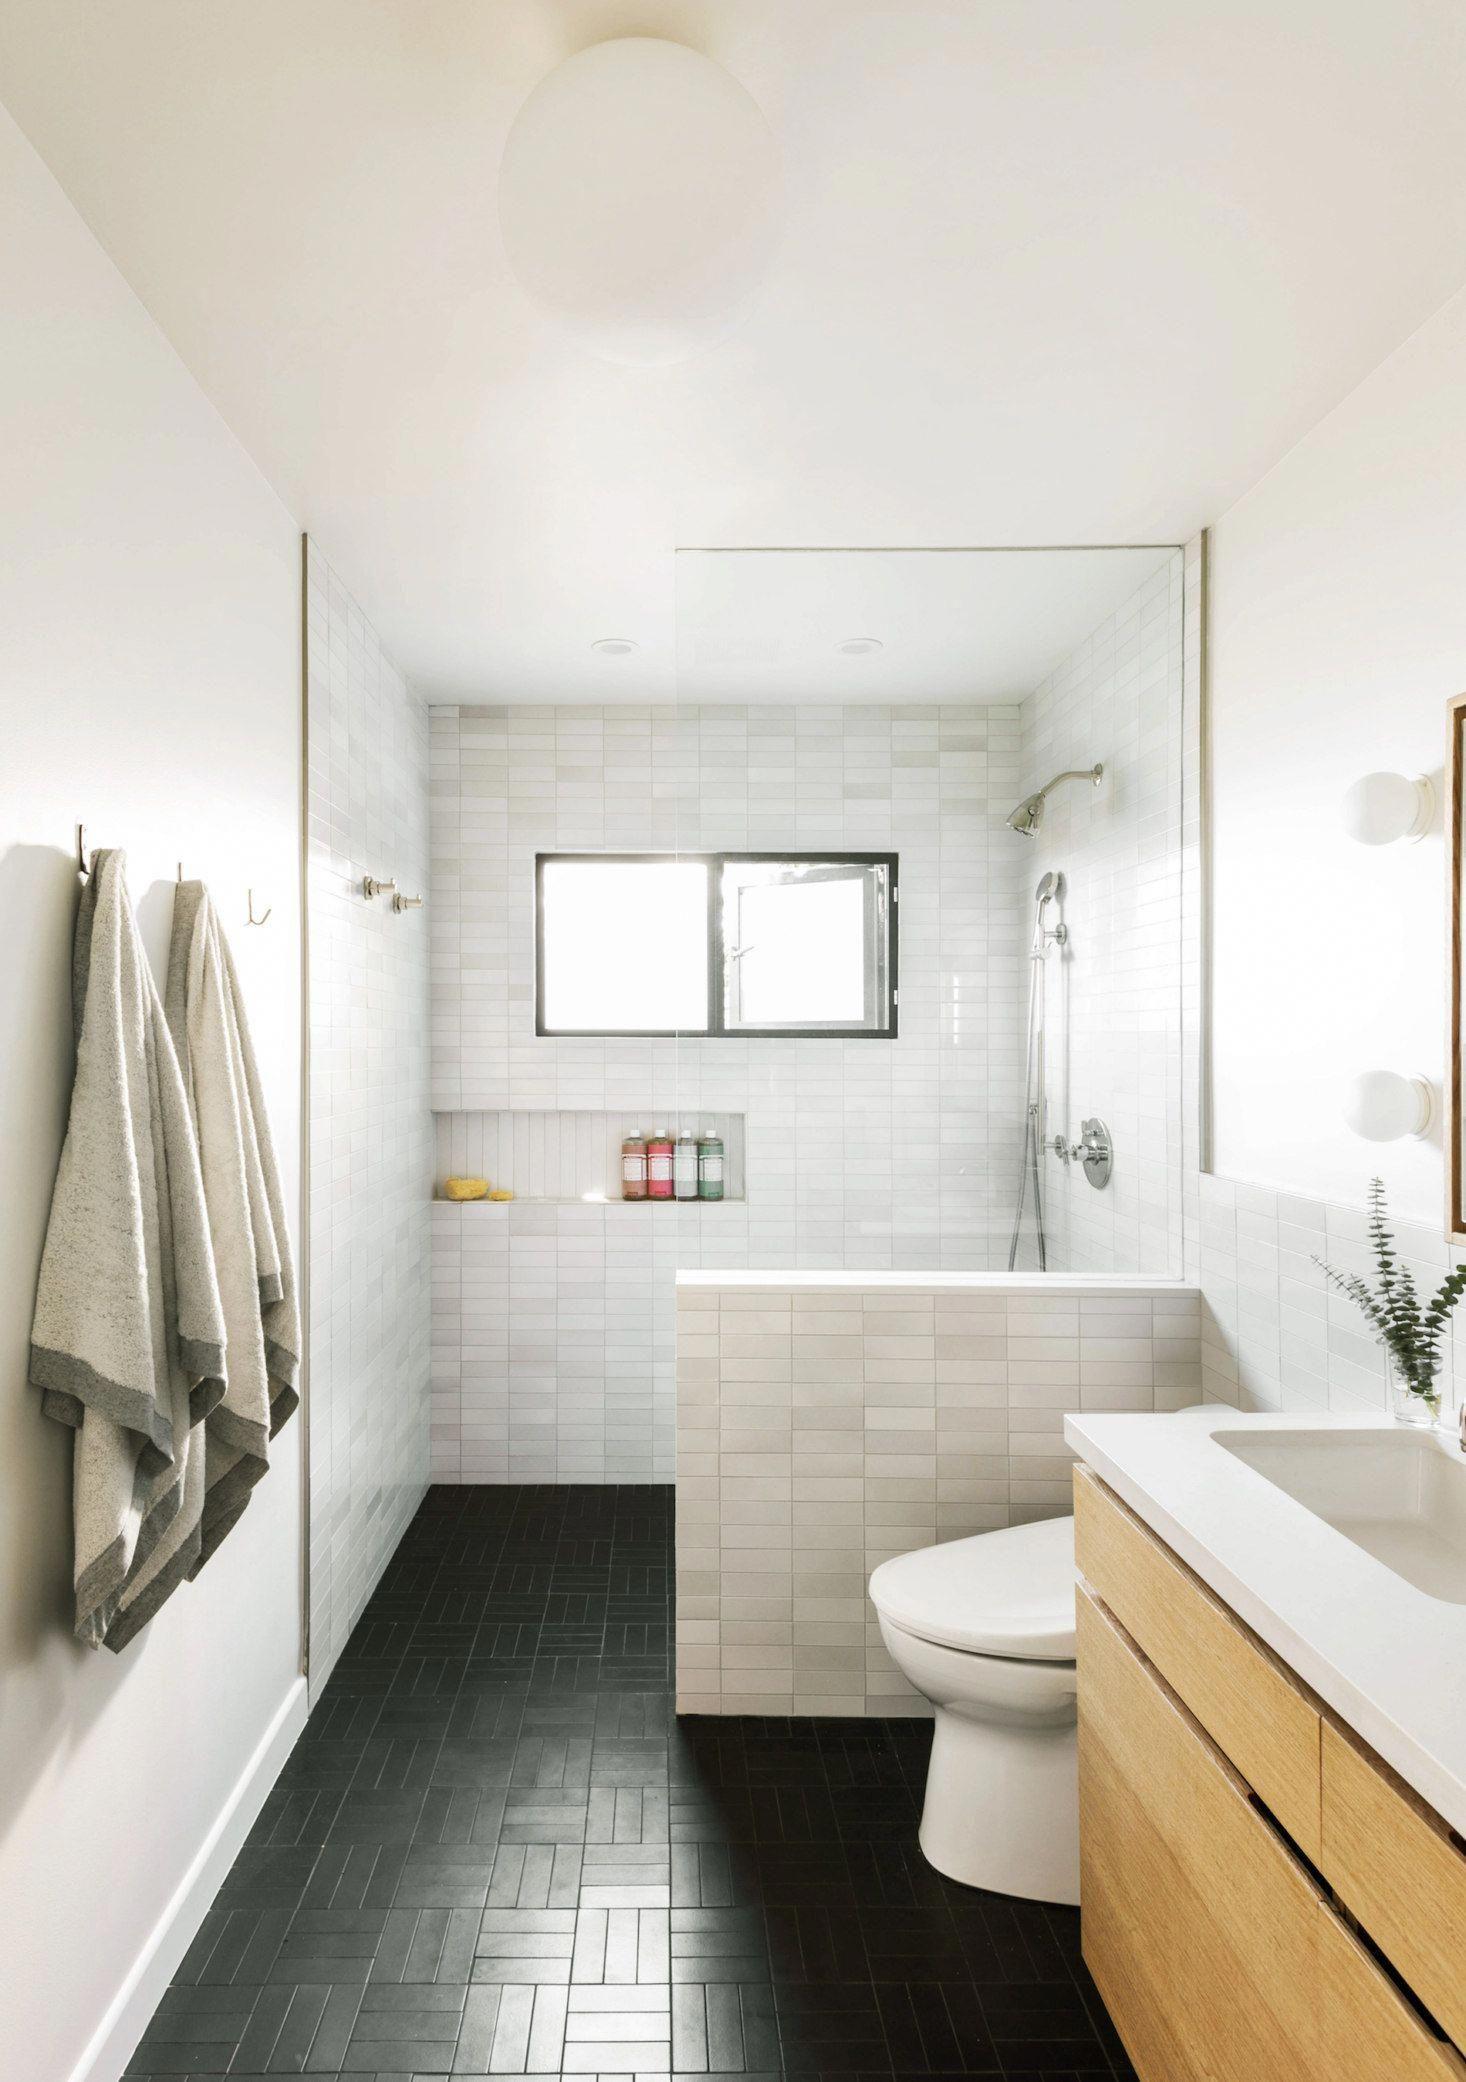 Comeonlight 9w Bathroom Vanity Light 360 Degree Rotation Modern